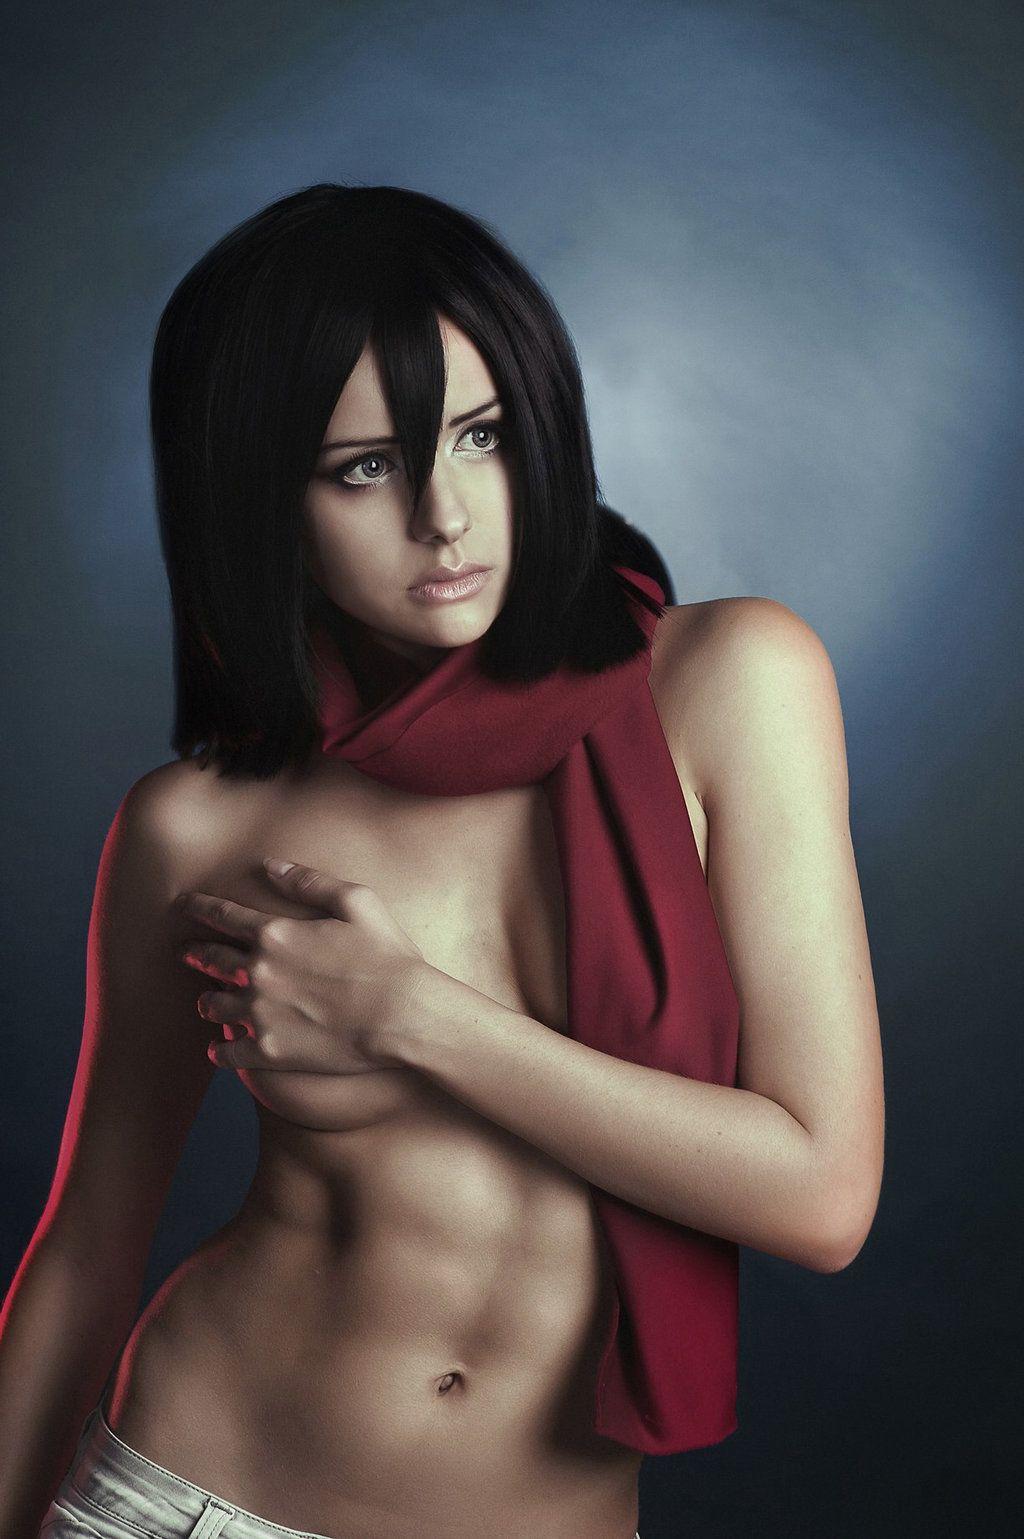 Mikasa nude girl